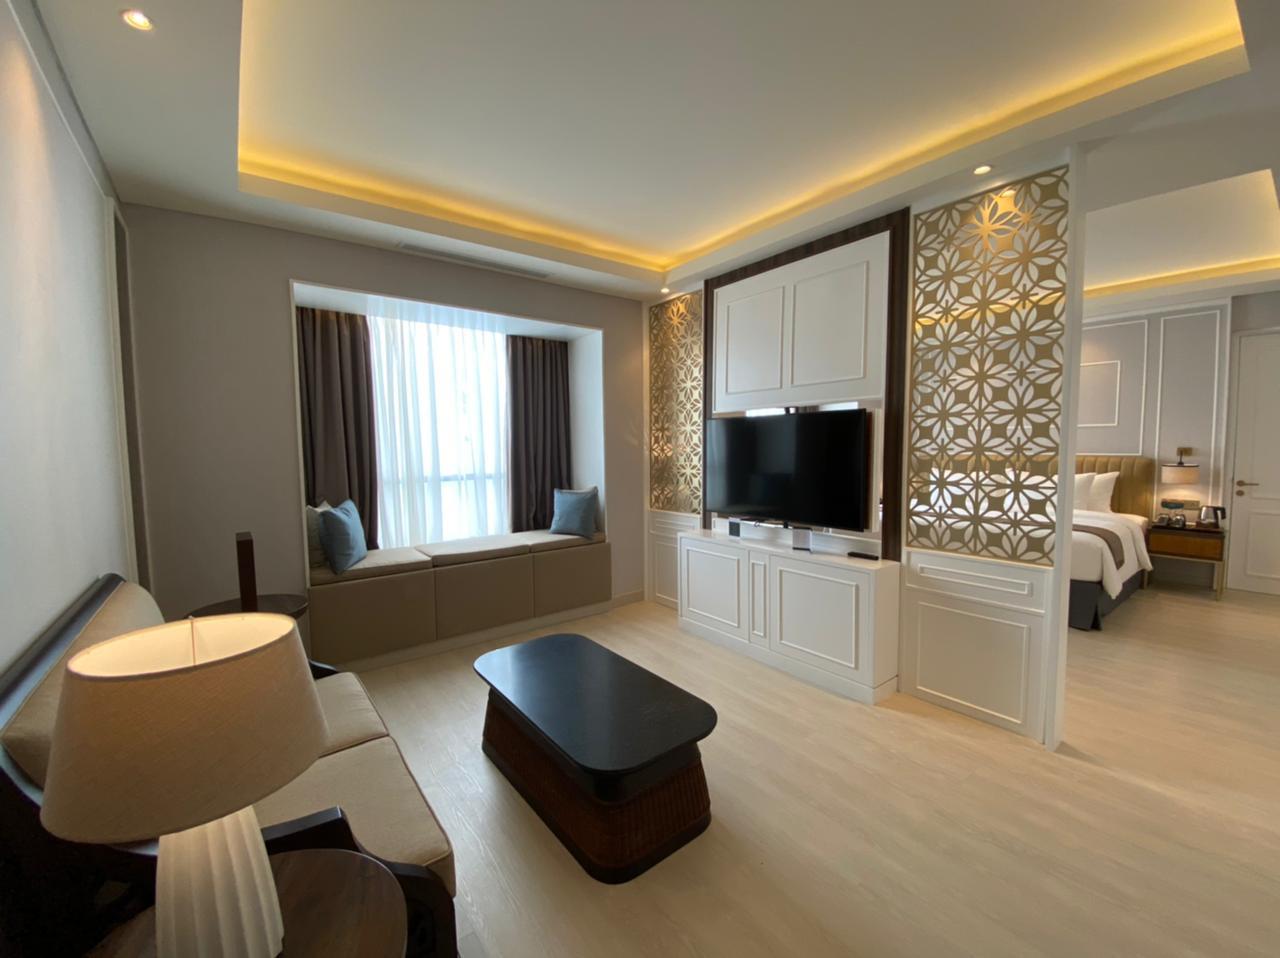 Sutasoma Suite/ Foto: Courtesy of Hotel Sutasoma